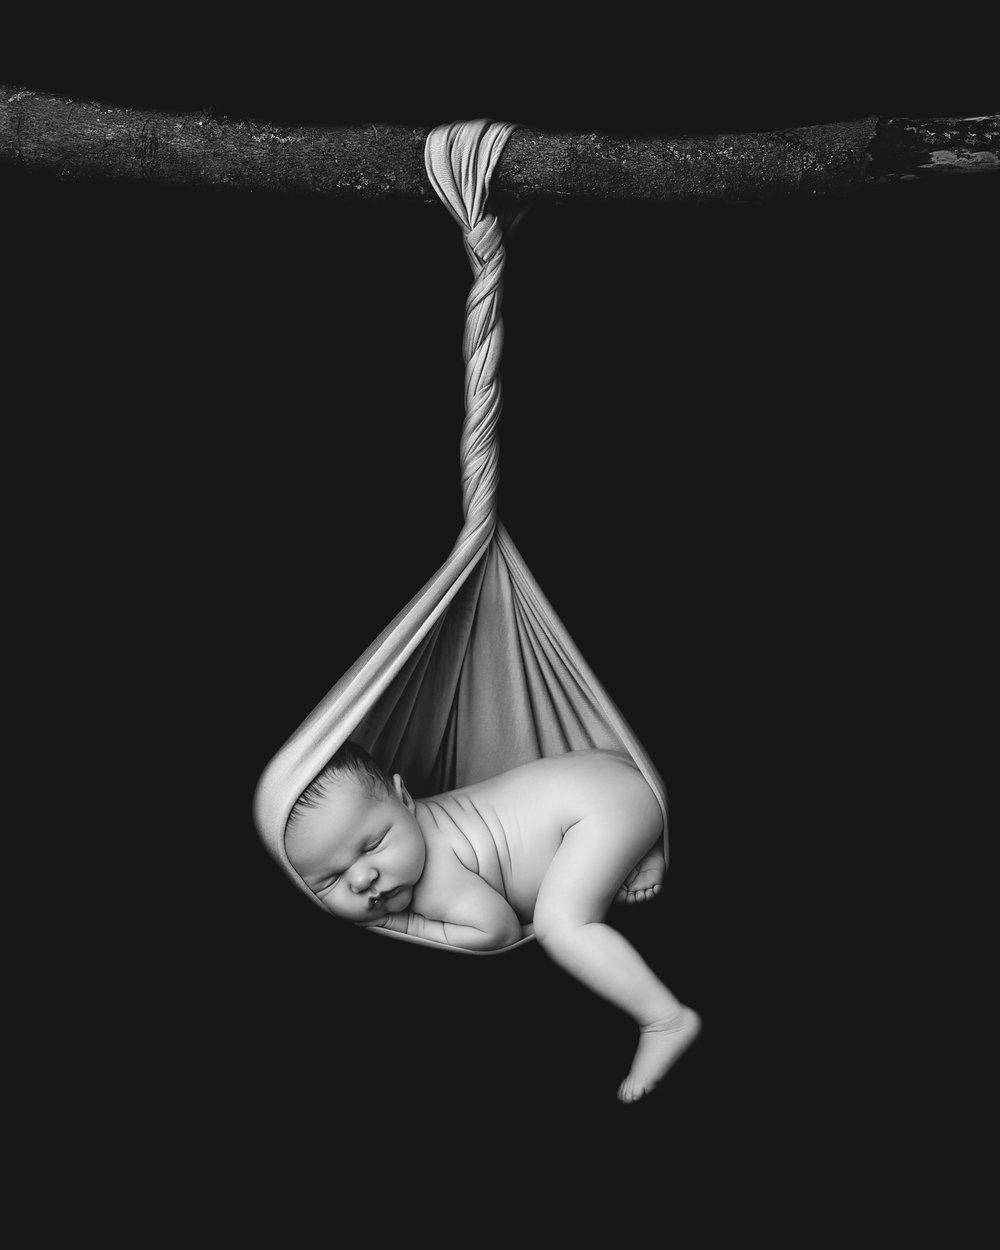 Newborn photographer based in Blandford Forum, Dorset